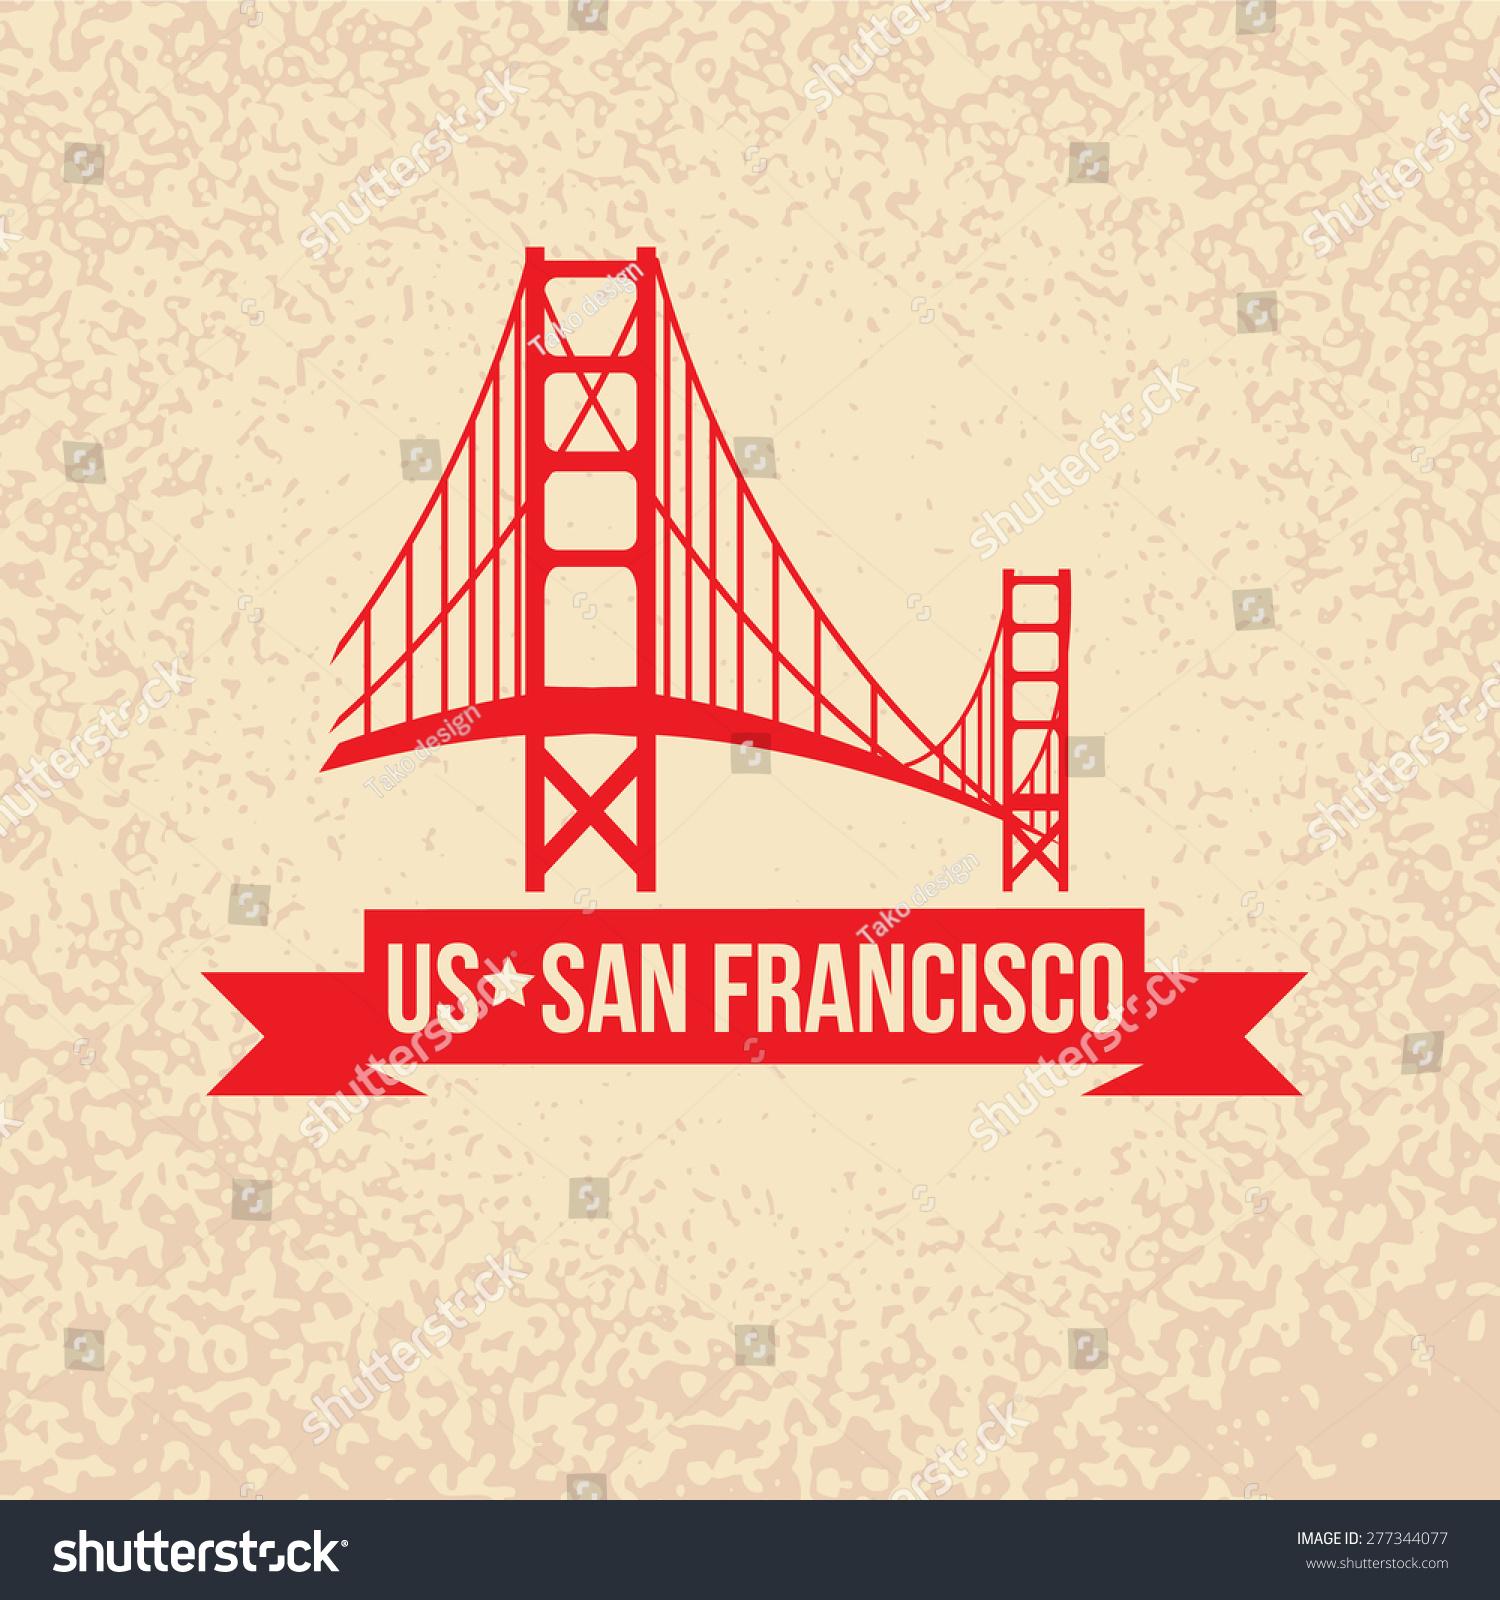 Royalty Free Golden Gate Bridge The Symbol Of Us 277344077